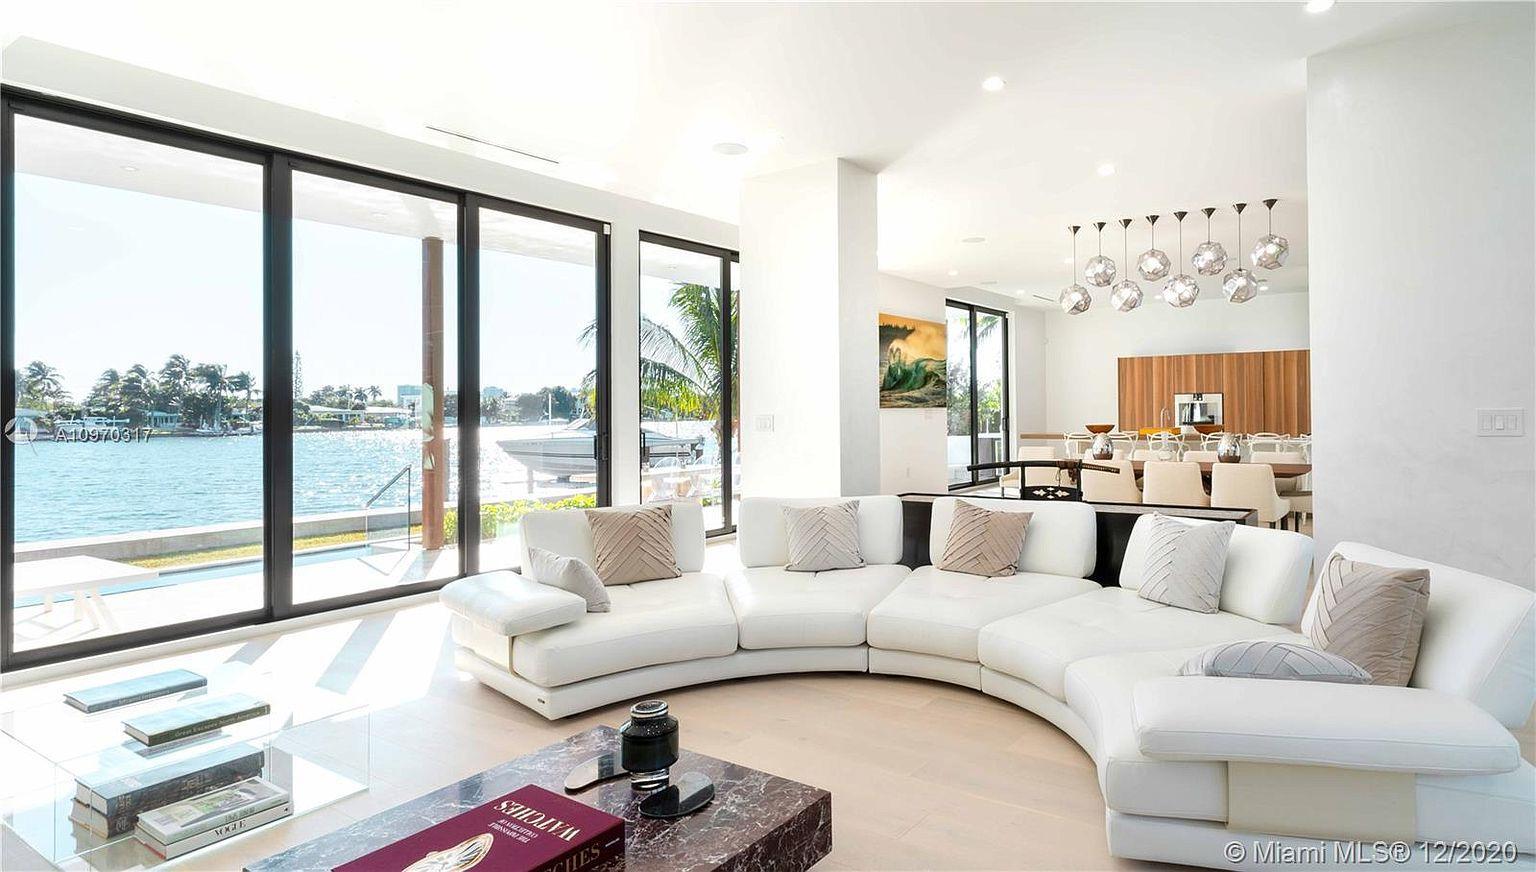 Luxury Neighborhoods: Biscayne Point